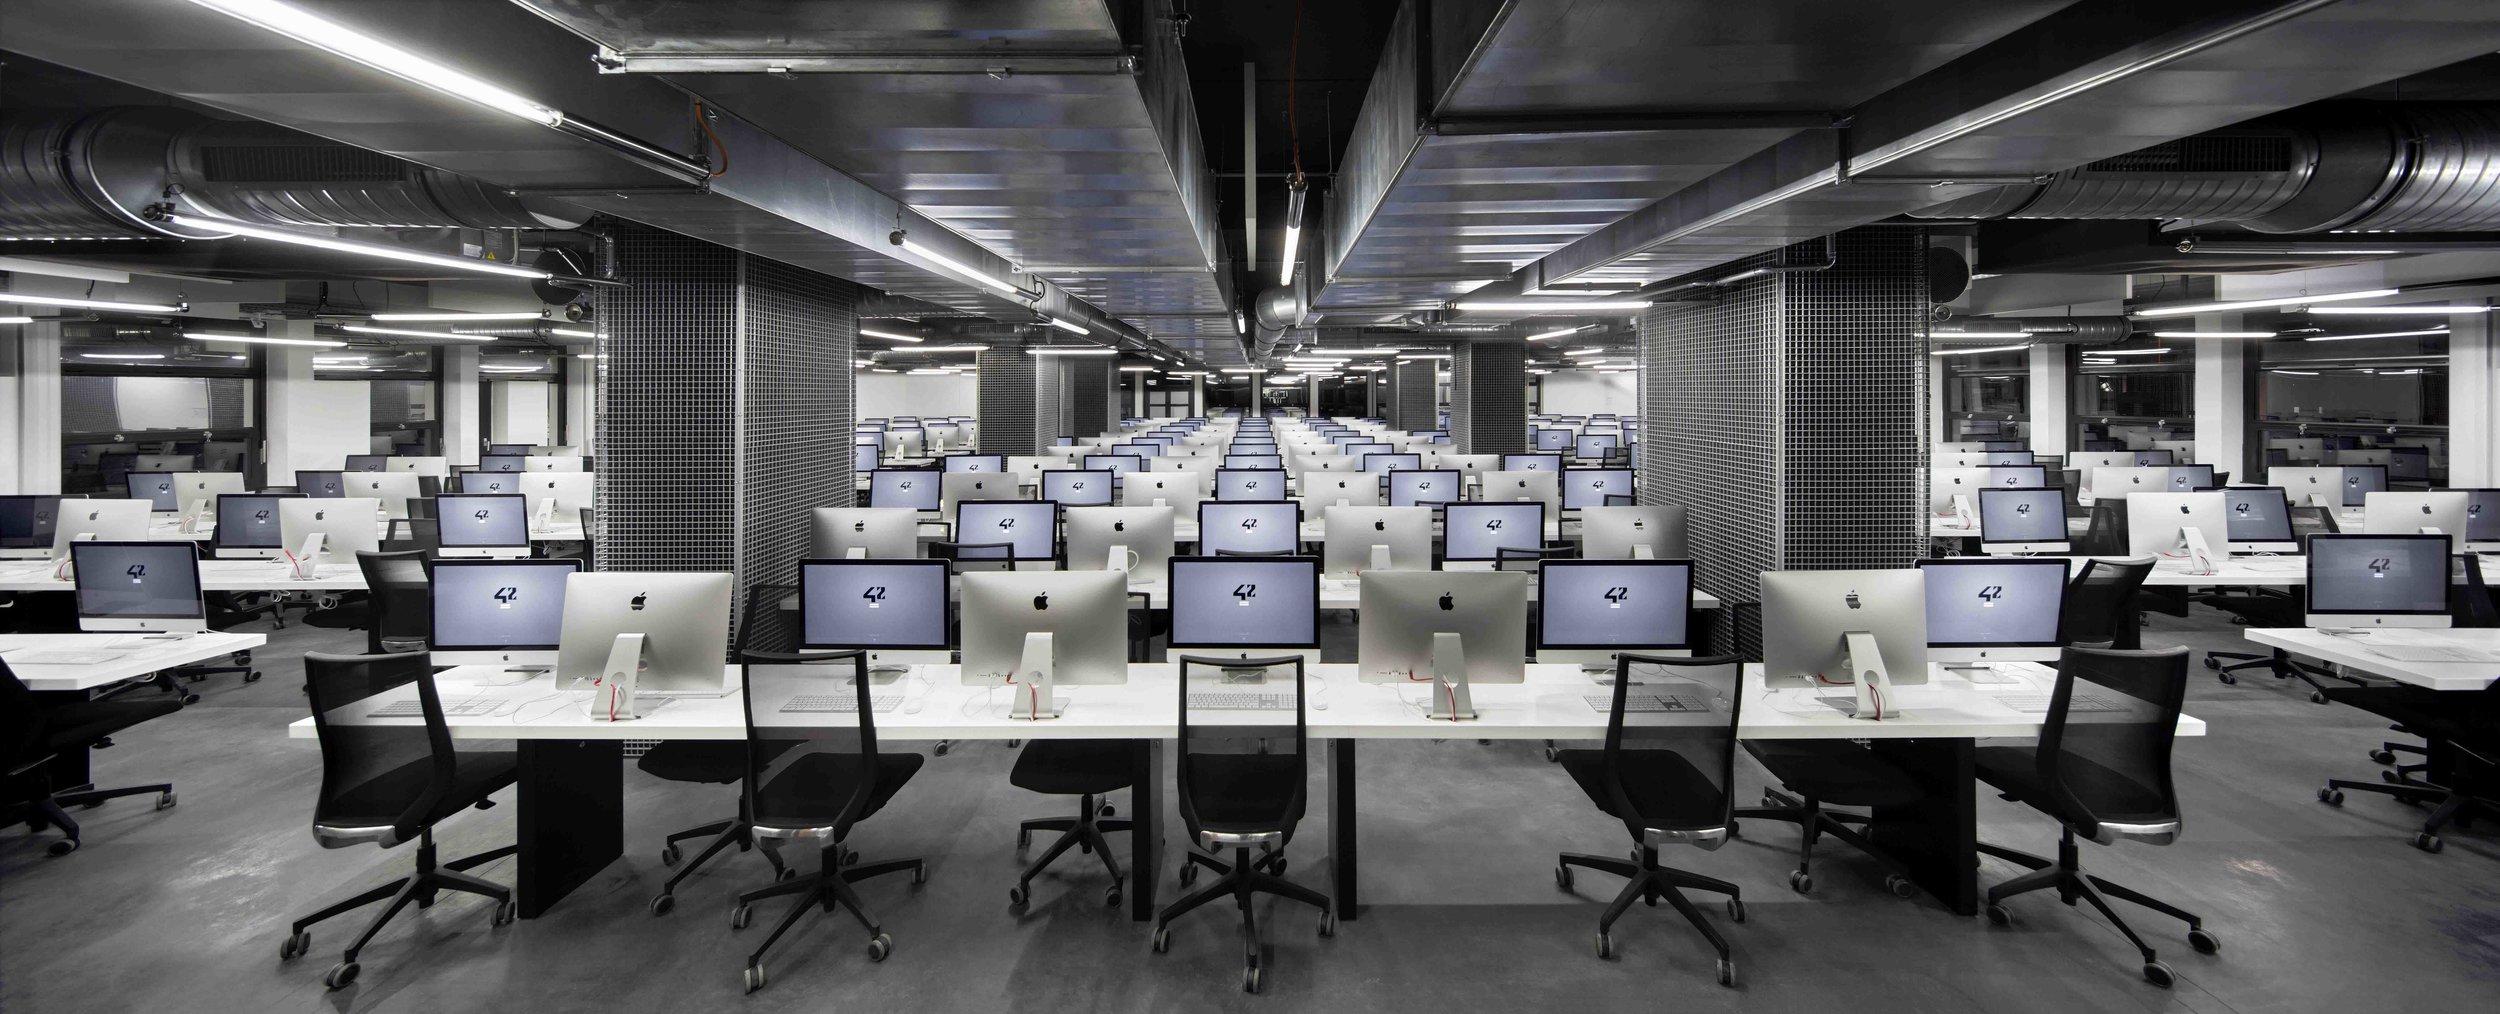 Ecole 42 - NOC 42 - AR Studio Architectures - Xavier NIEL - Kwame YAMGNANE - Florian BUCHER - Nicolas SADIRAC - Free - Reinventer Paris (3).jpg